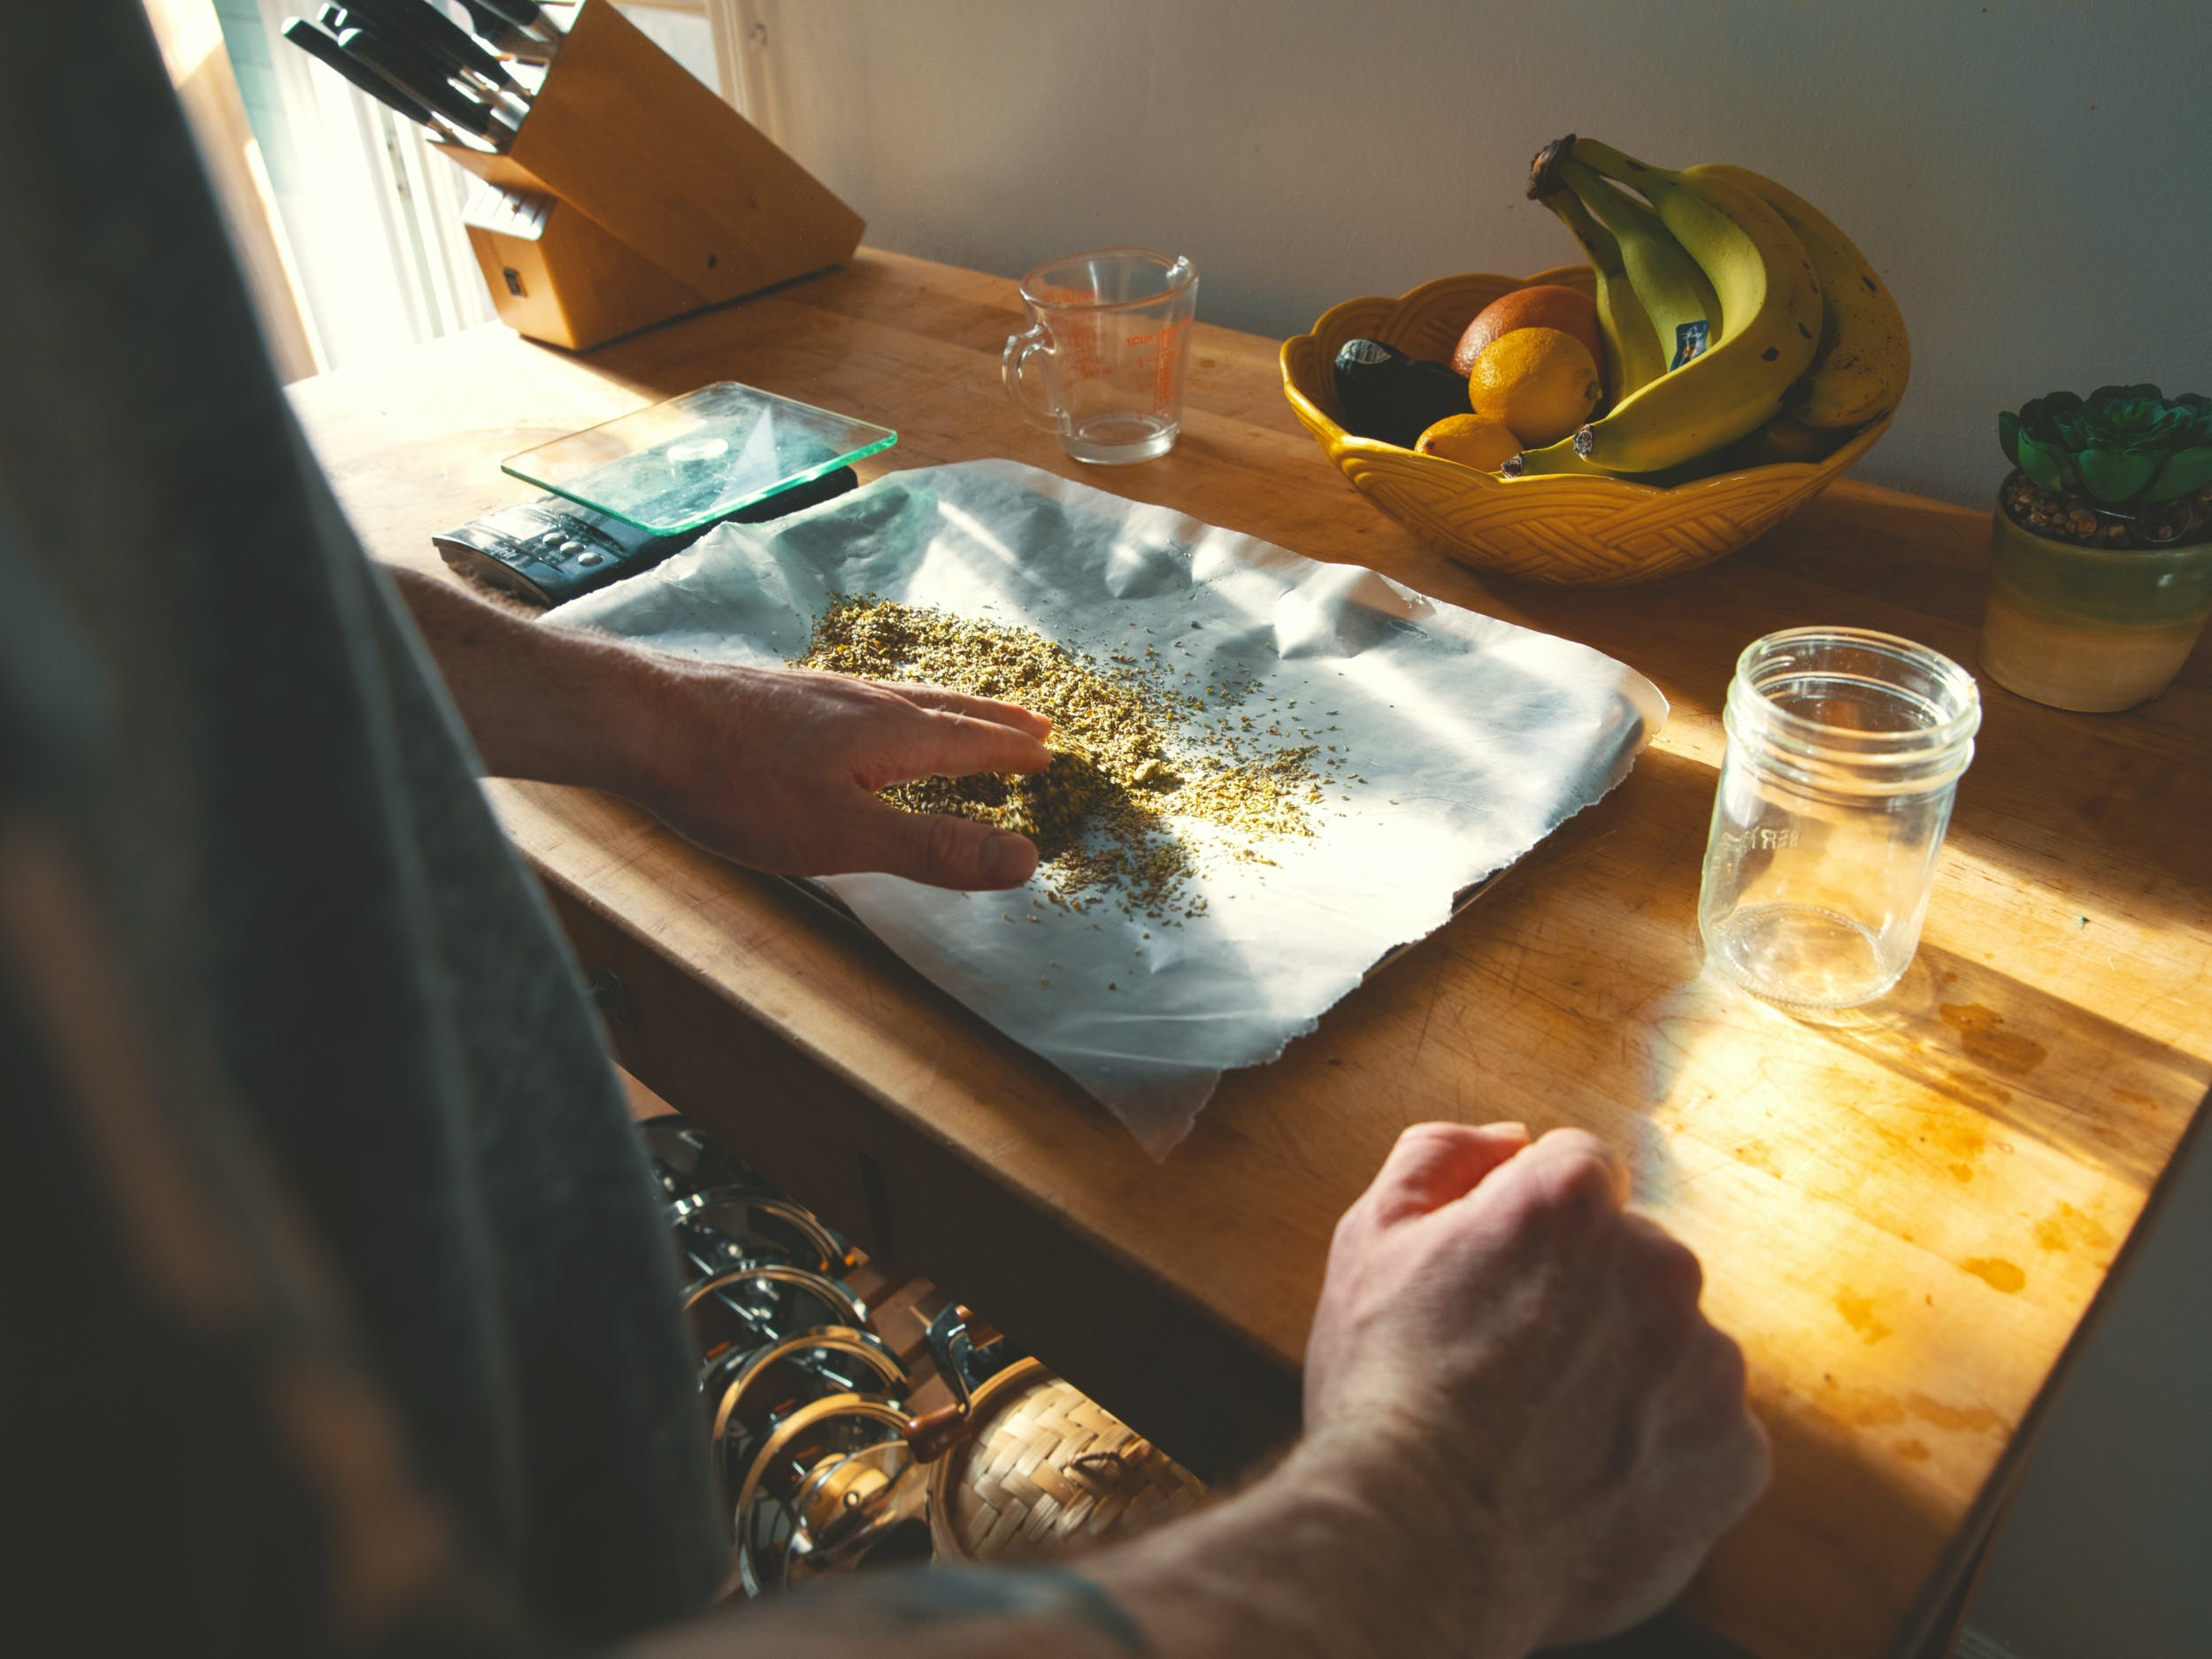 How to Make Cannabis Tincture 102 e1548365331558 Heres How to Make Cannabis Tincture in Your Own Kitchen